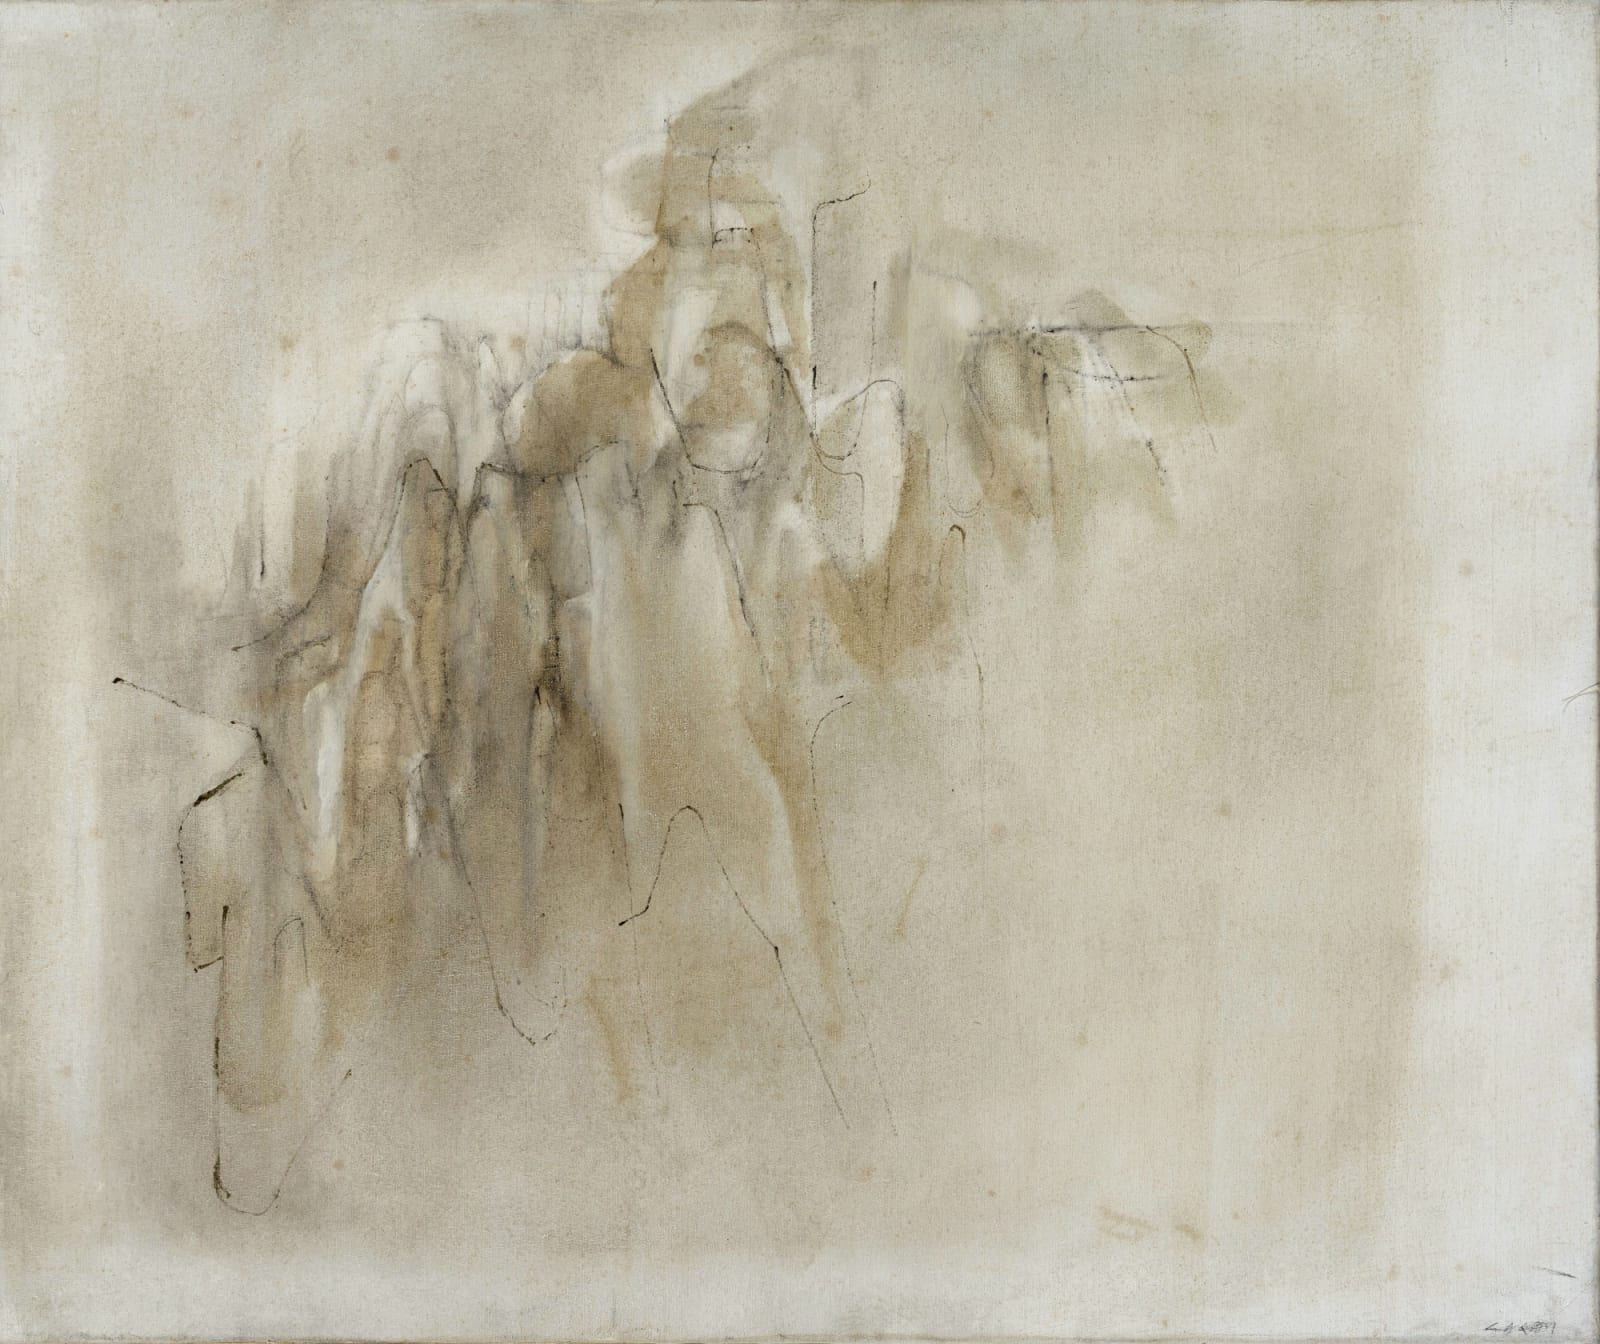 Lalan 謝景蘭, Un coin de la vue | Corner of the View 《視覺的一角》, 1981